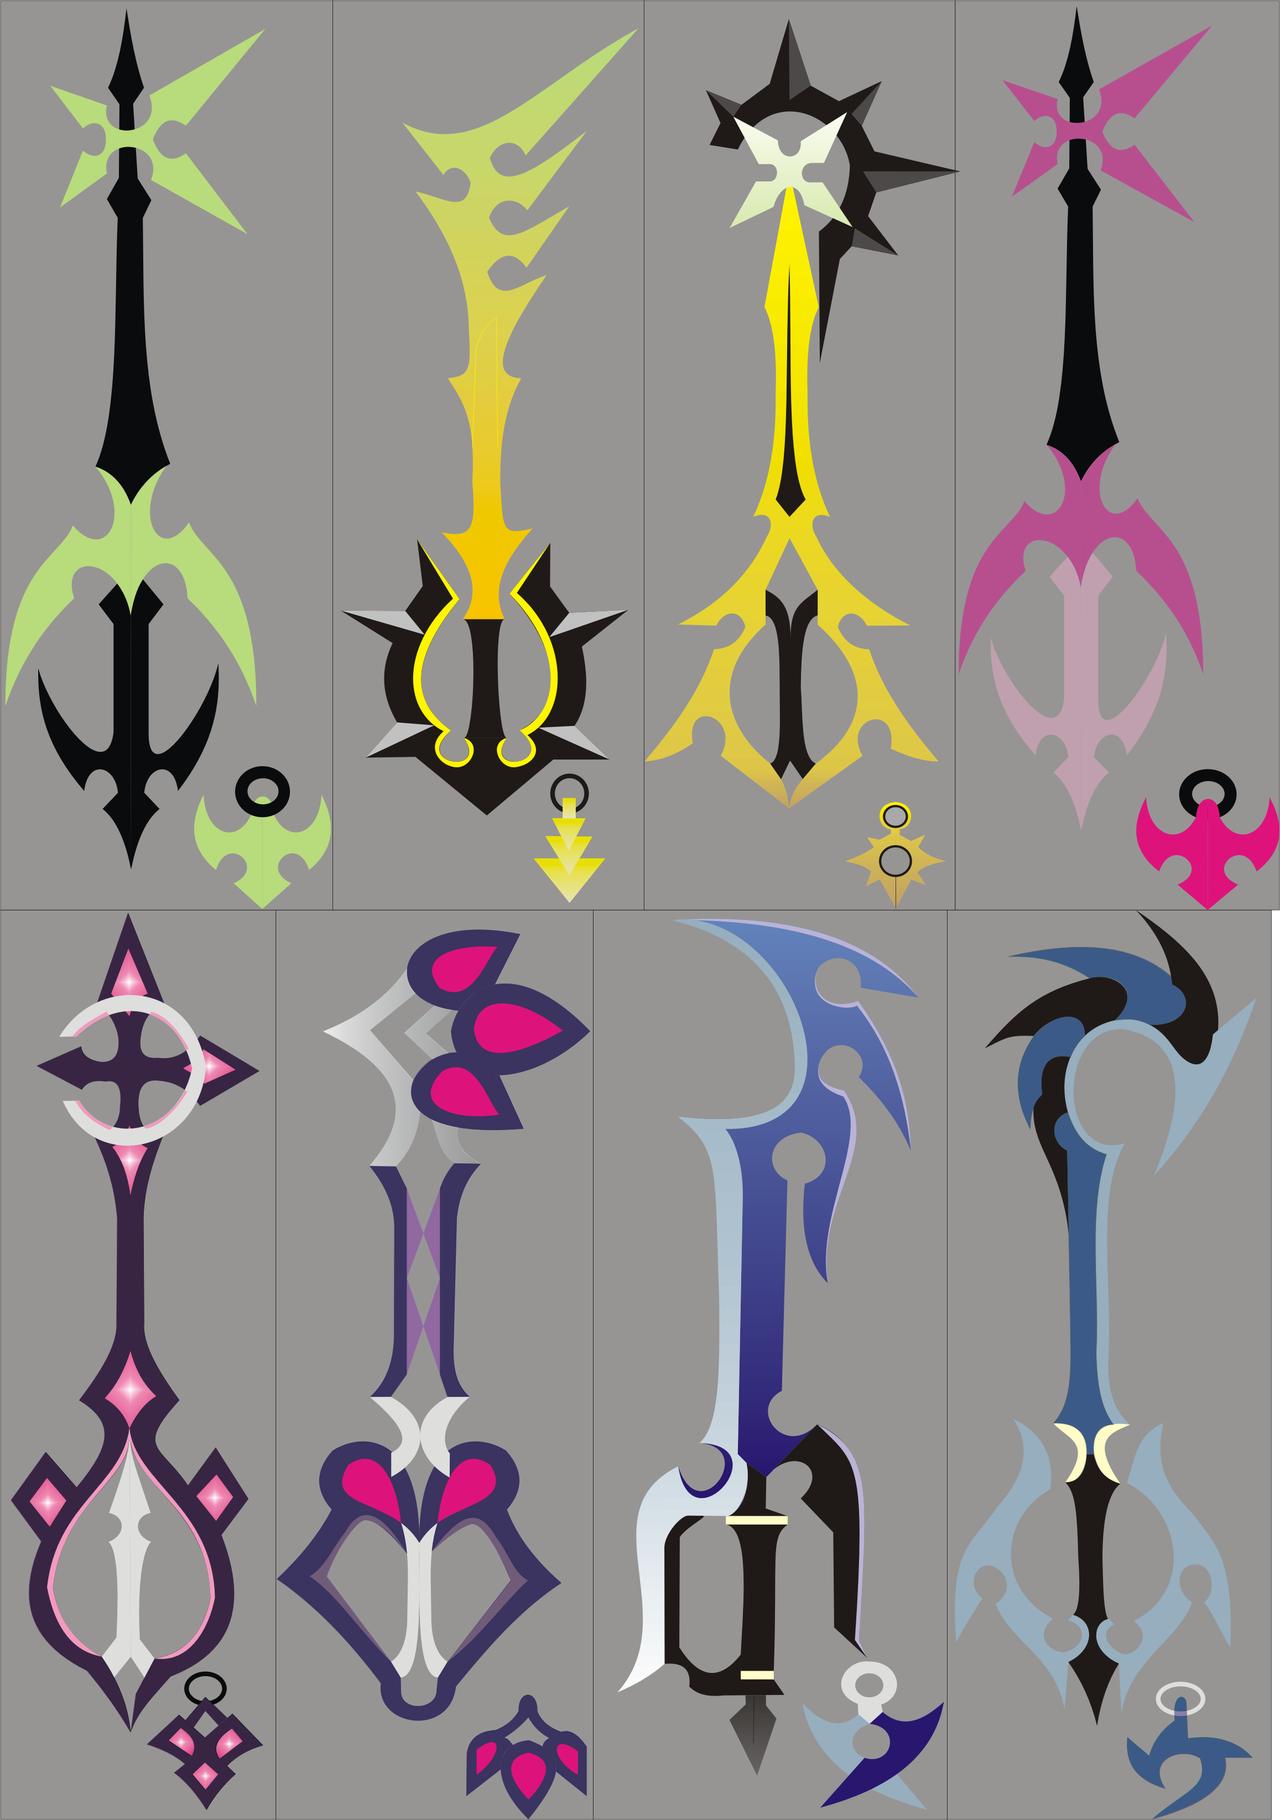 Kingdom Hearts List of Keyblades Kingdom Hearts 1 Keyblade List